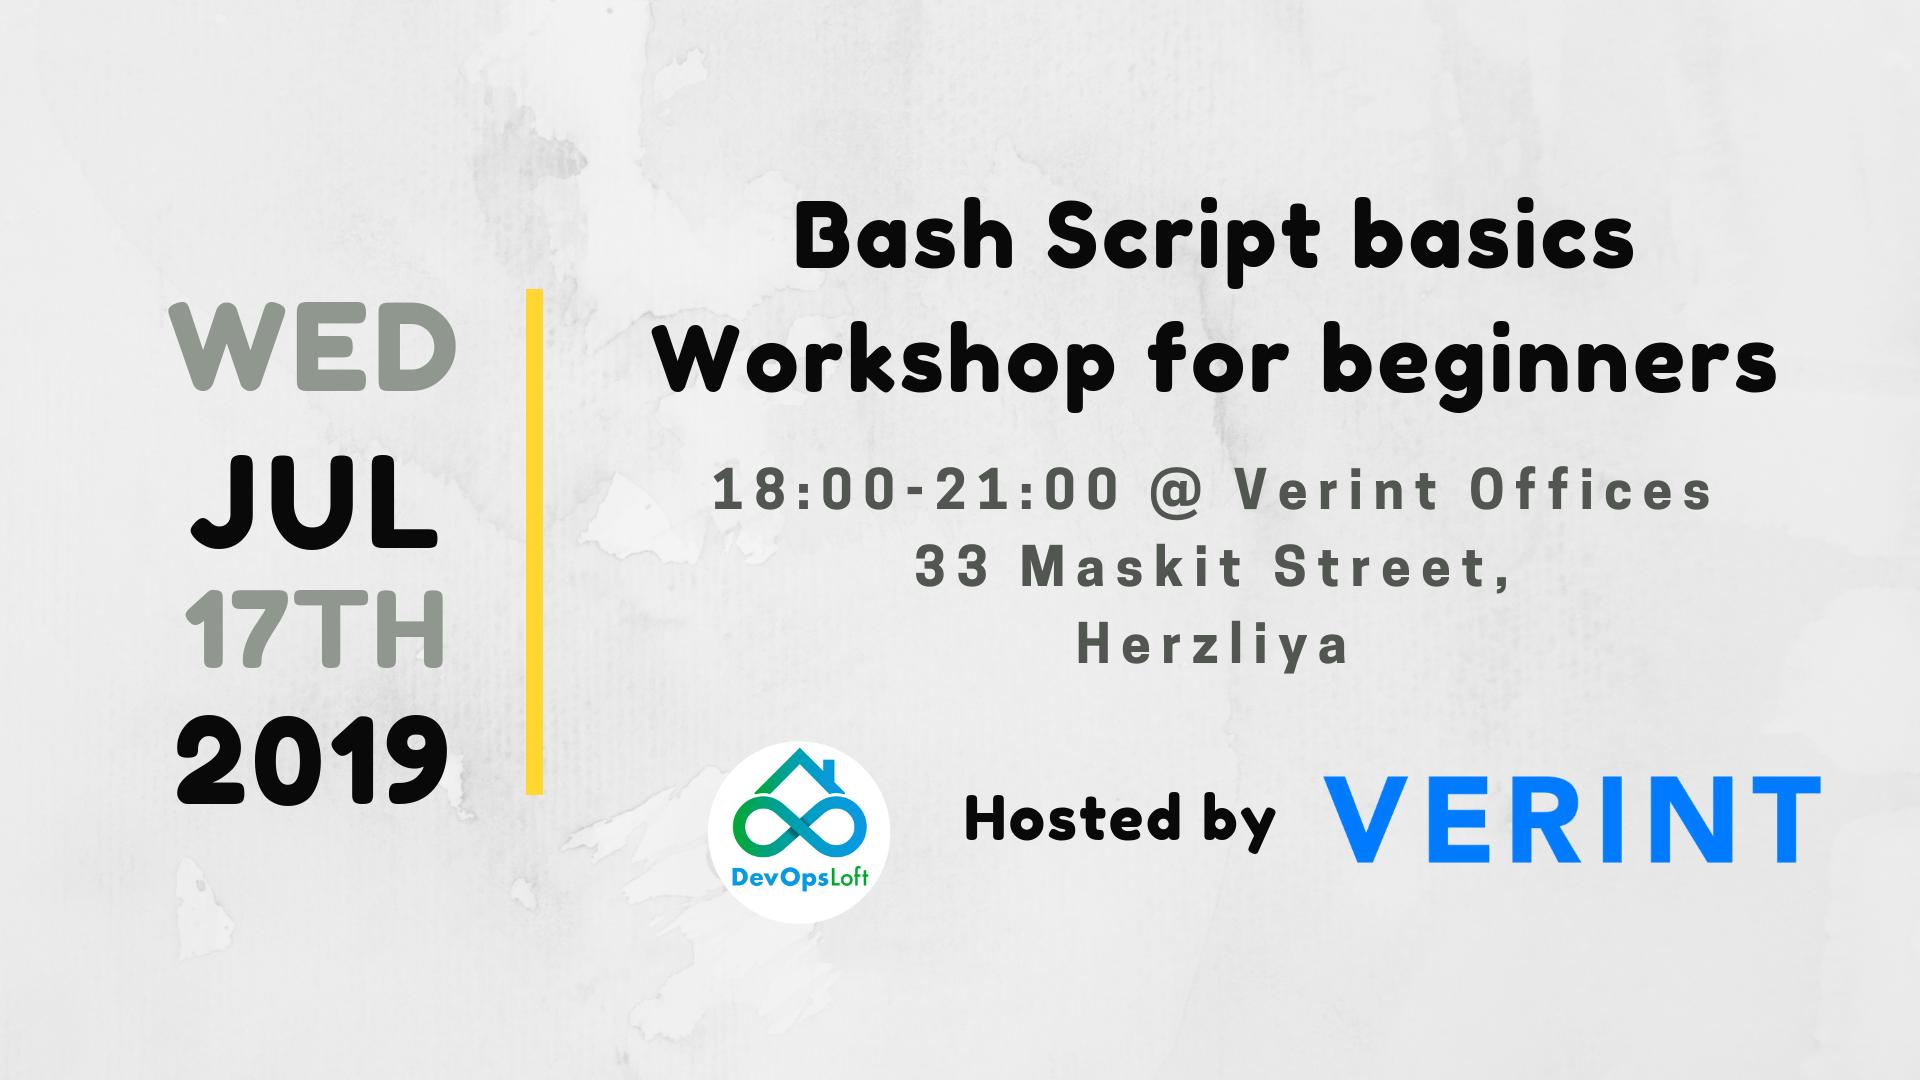 Bash Scripting basics - Workshop for beginners